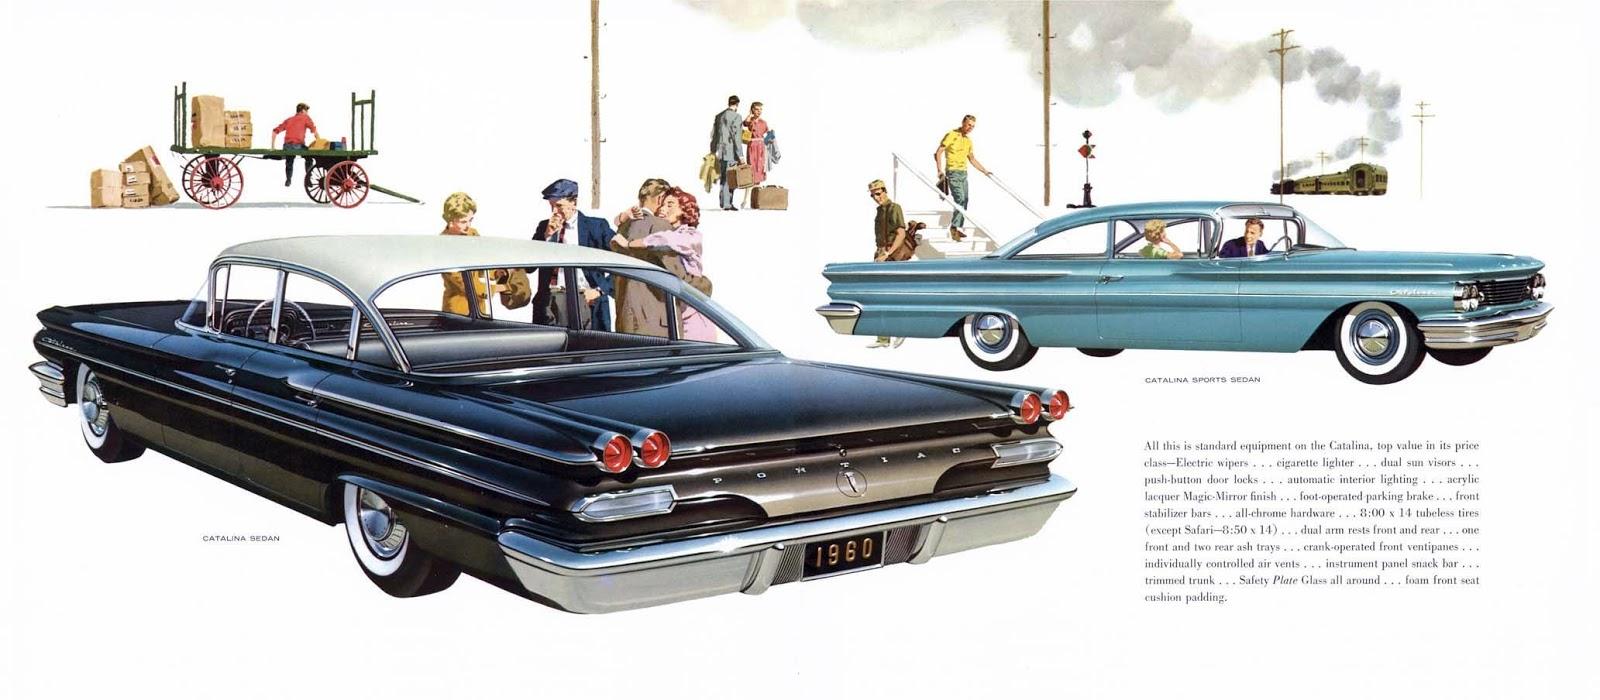 Transpress Nz 1960 Pontiac Promo Art Catalina 2 Door